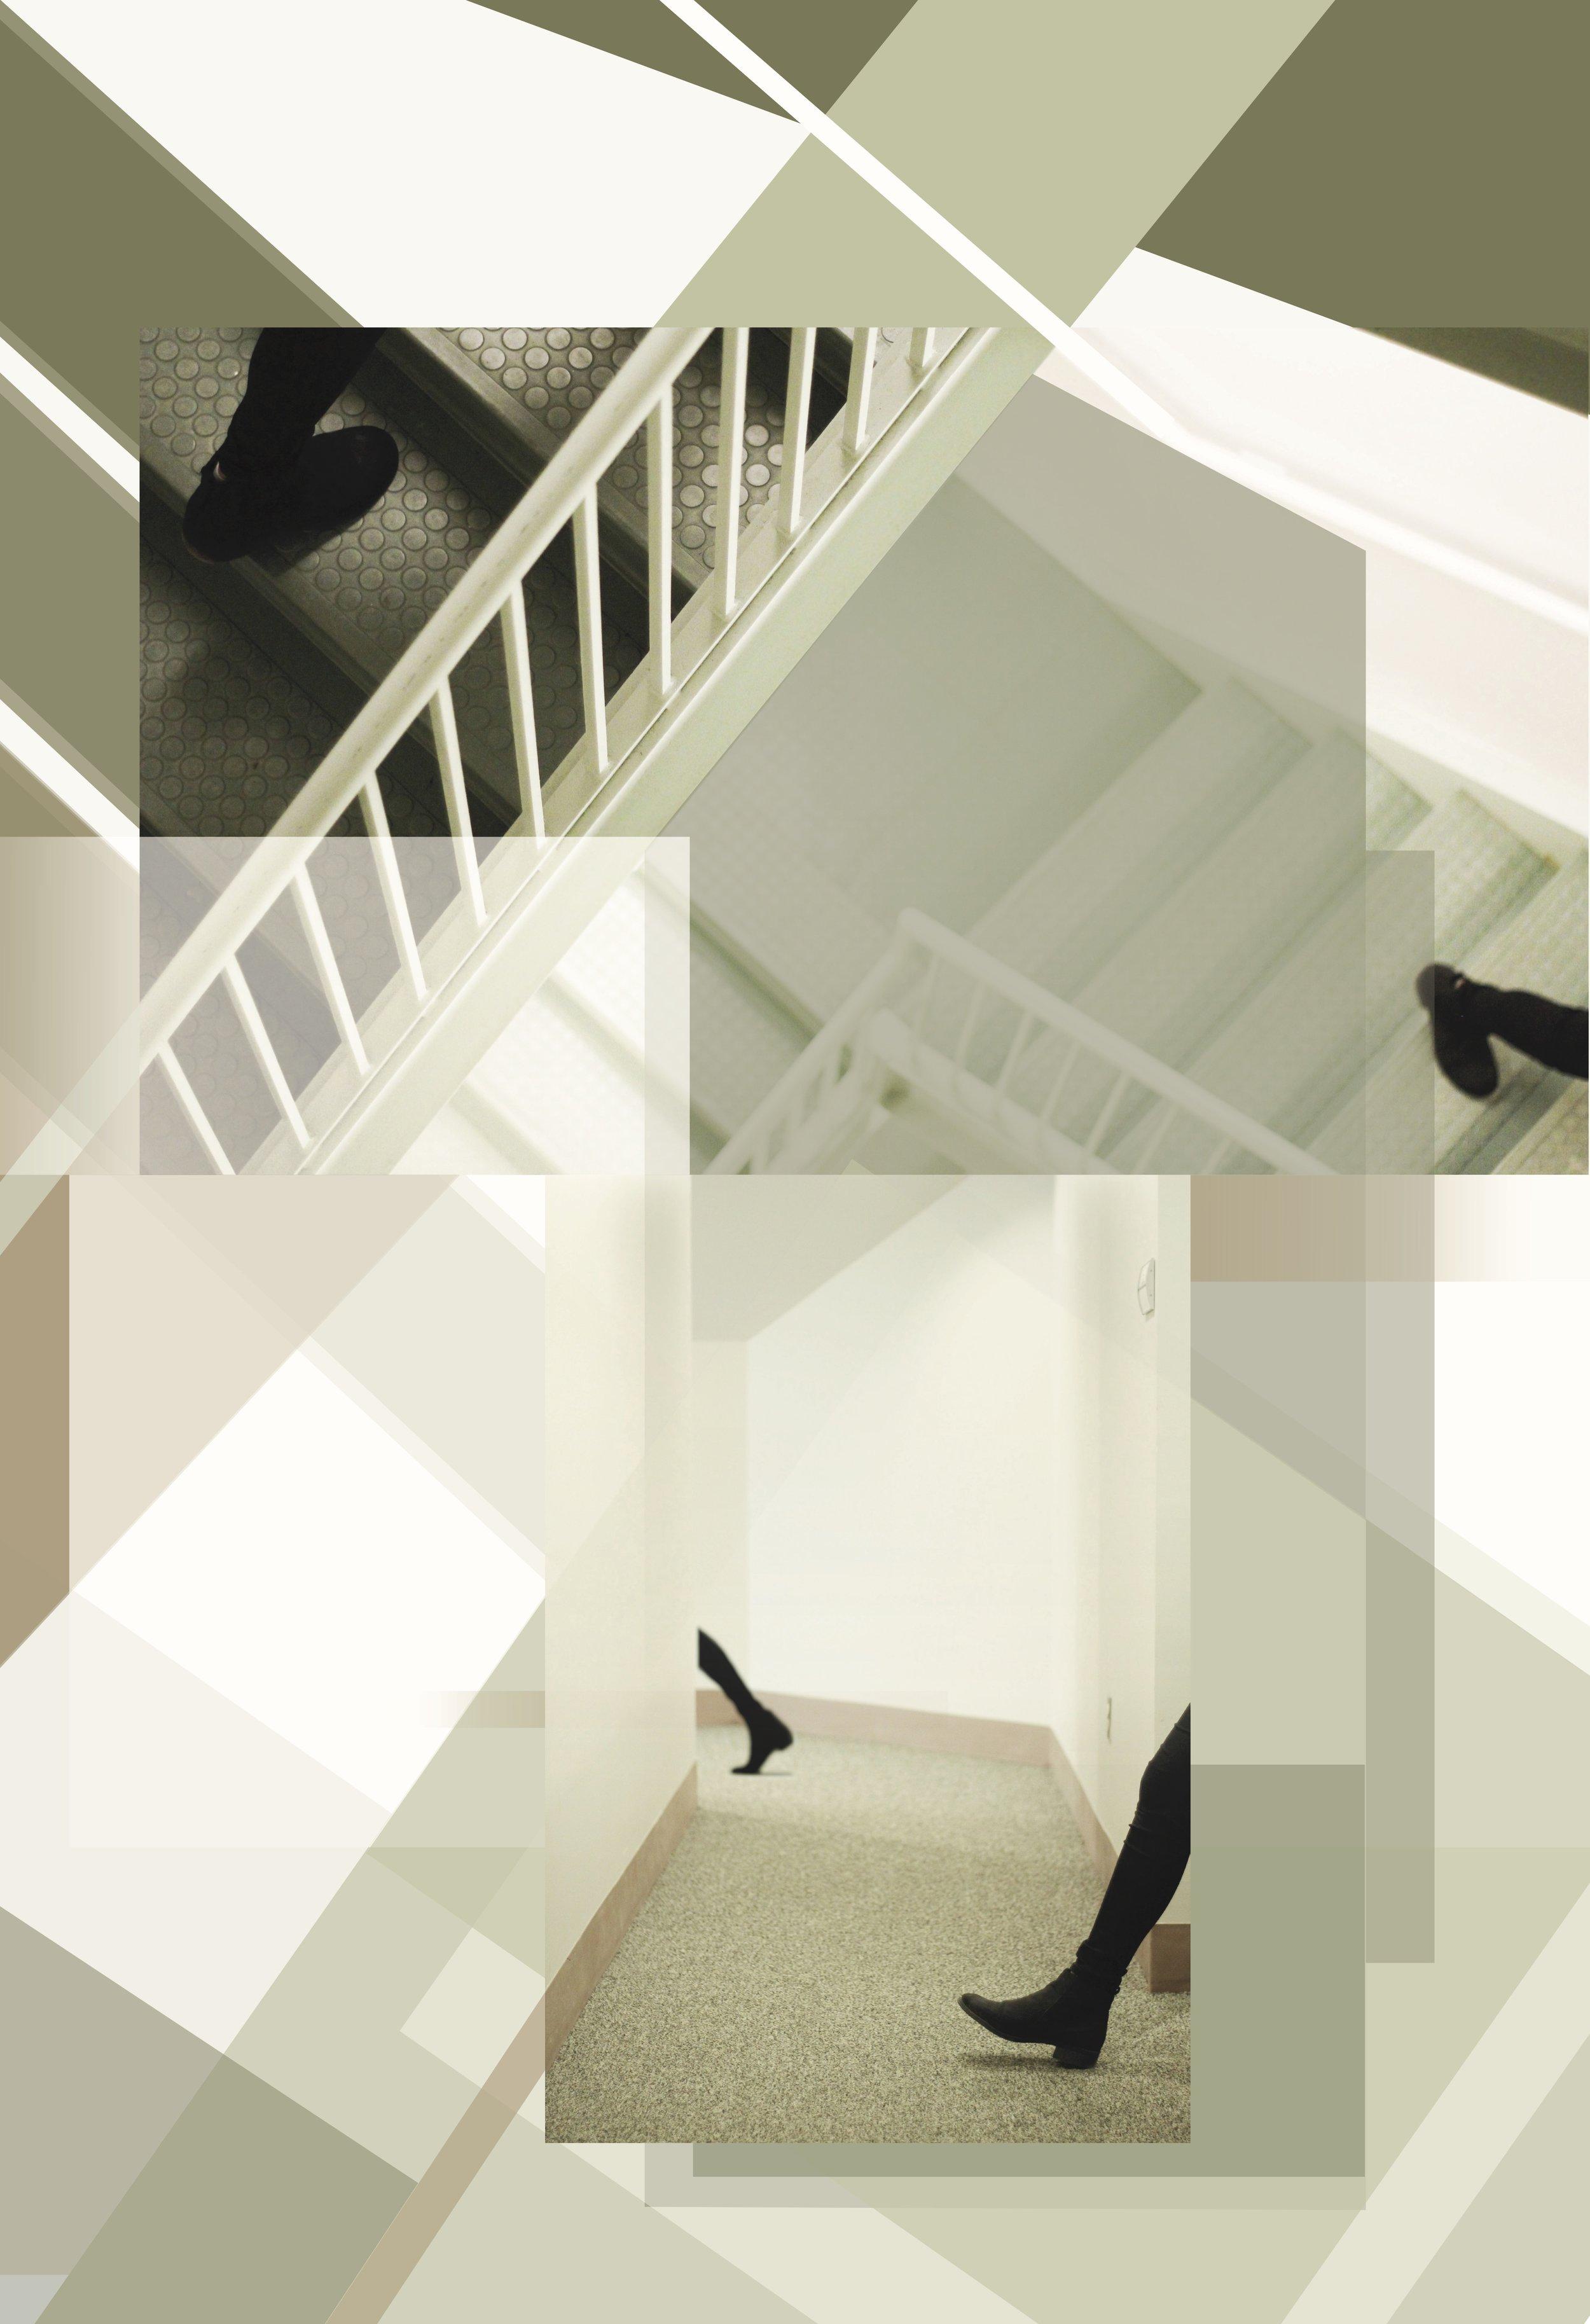 StairsShapeStudy3.jpg